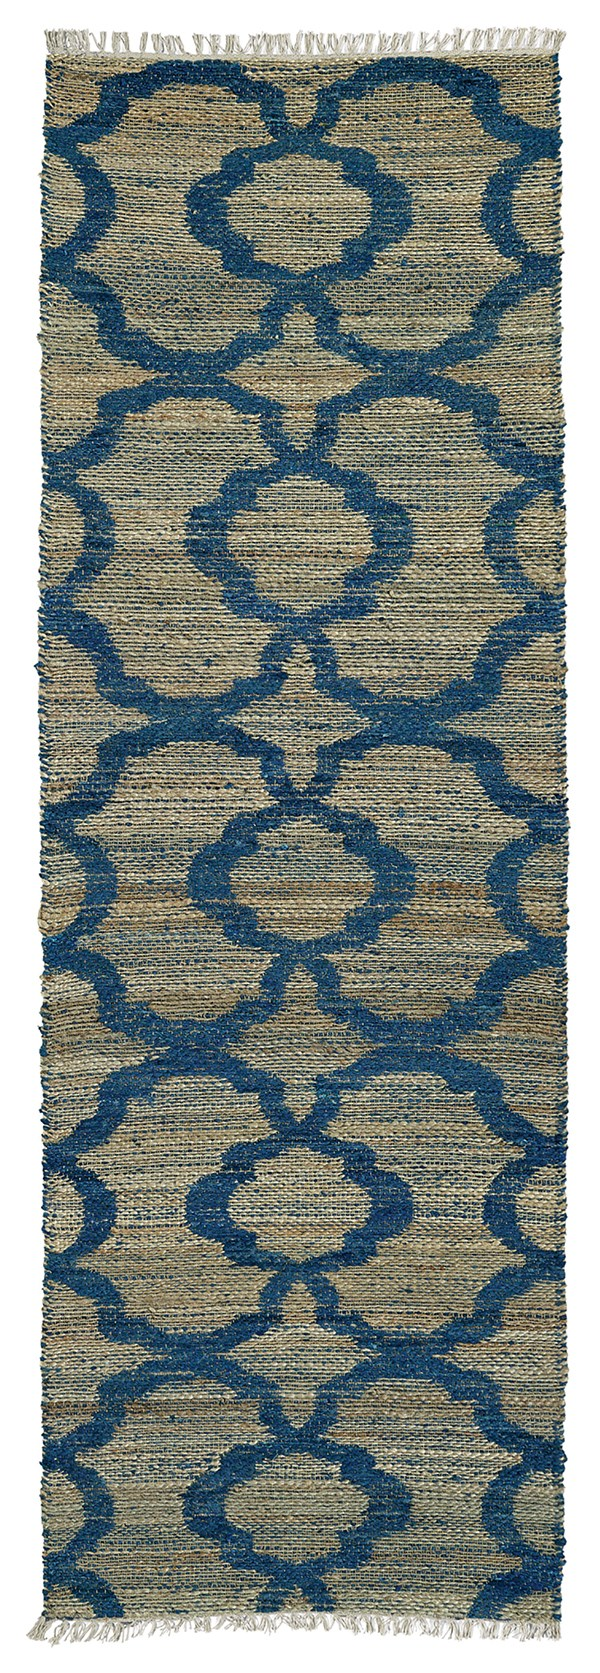 Blue, Natural Fiber (17) Moroccan Area Rug